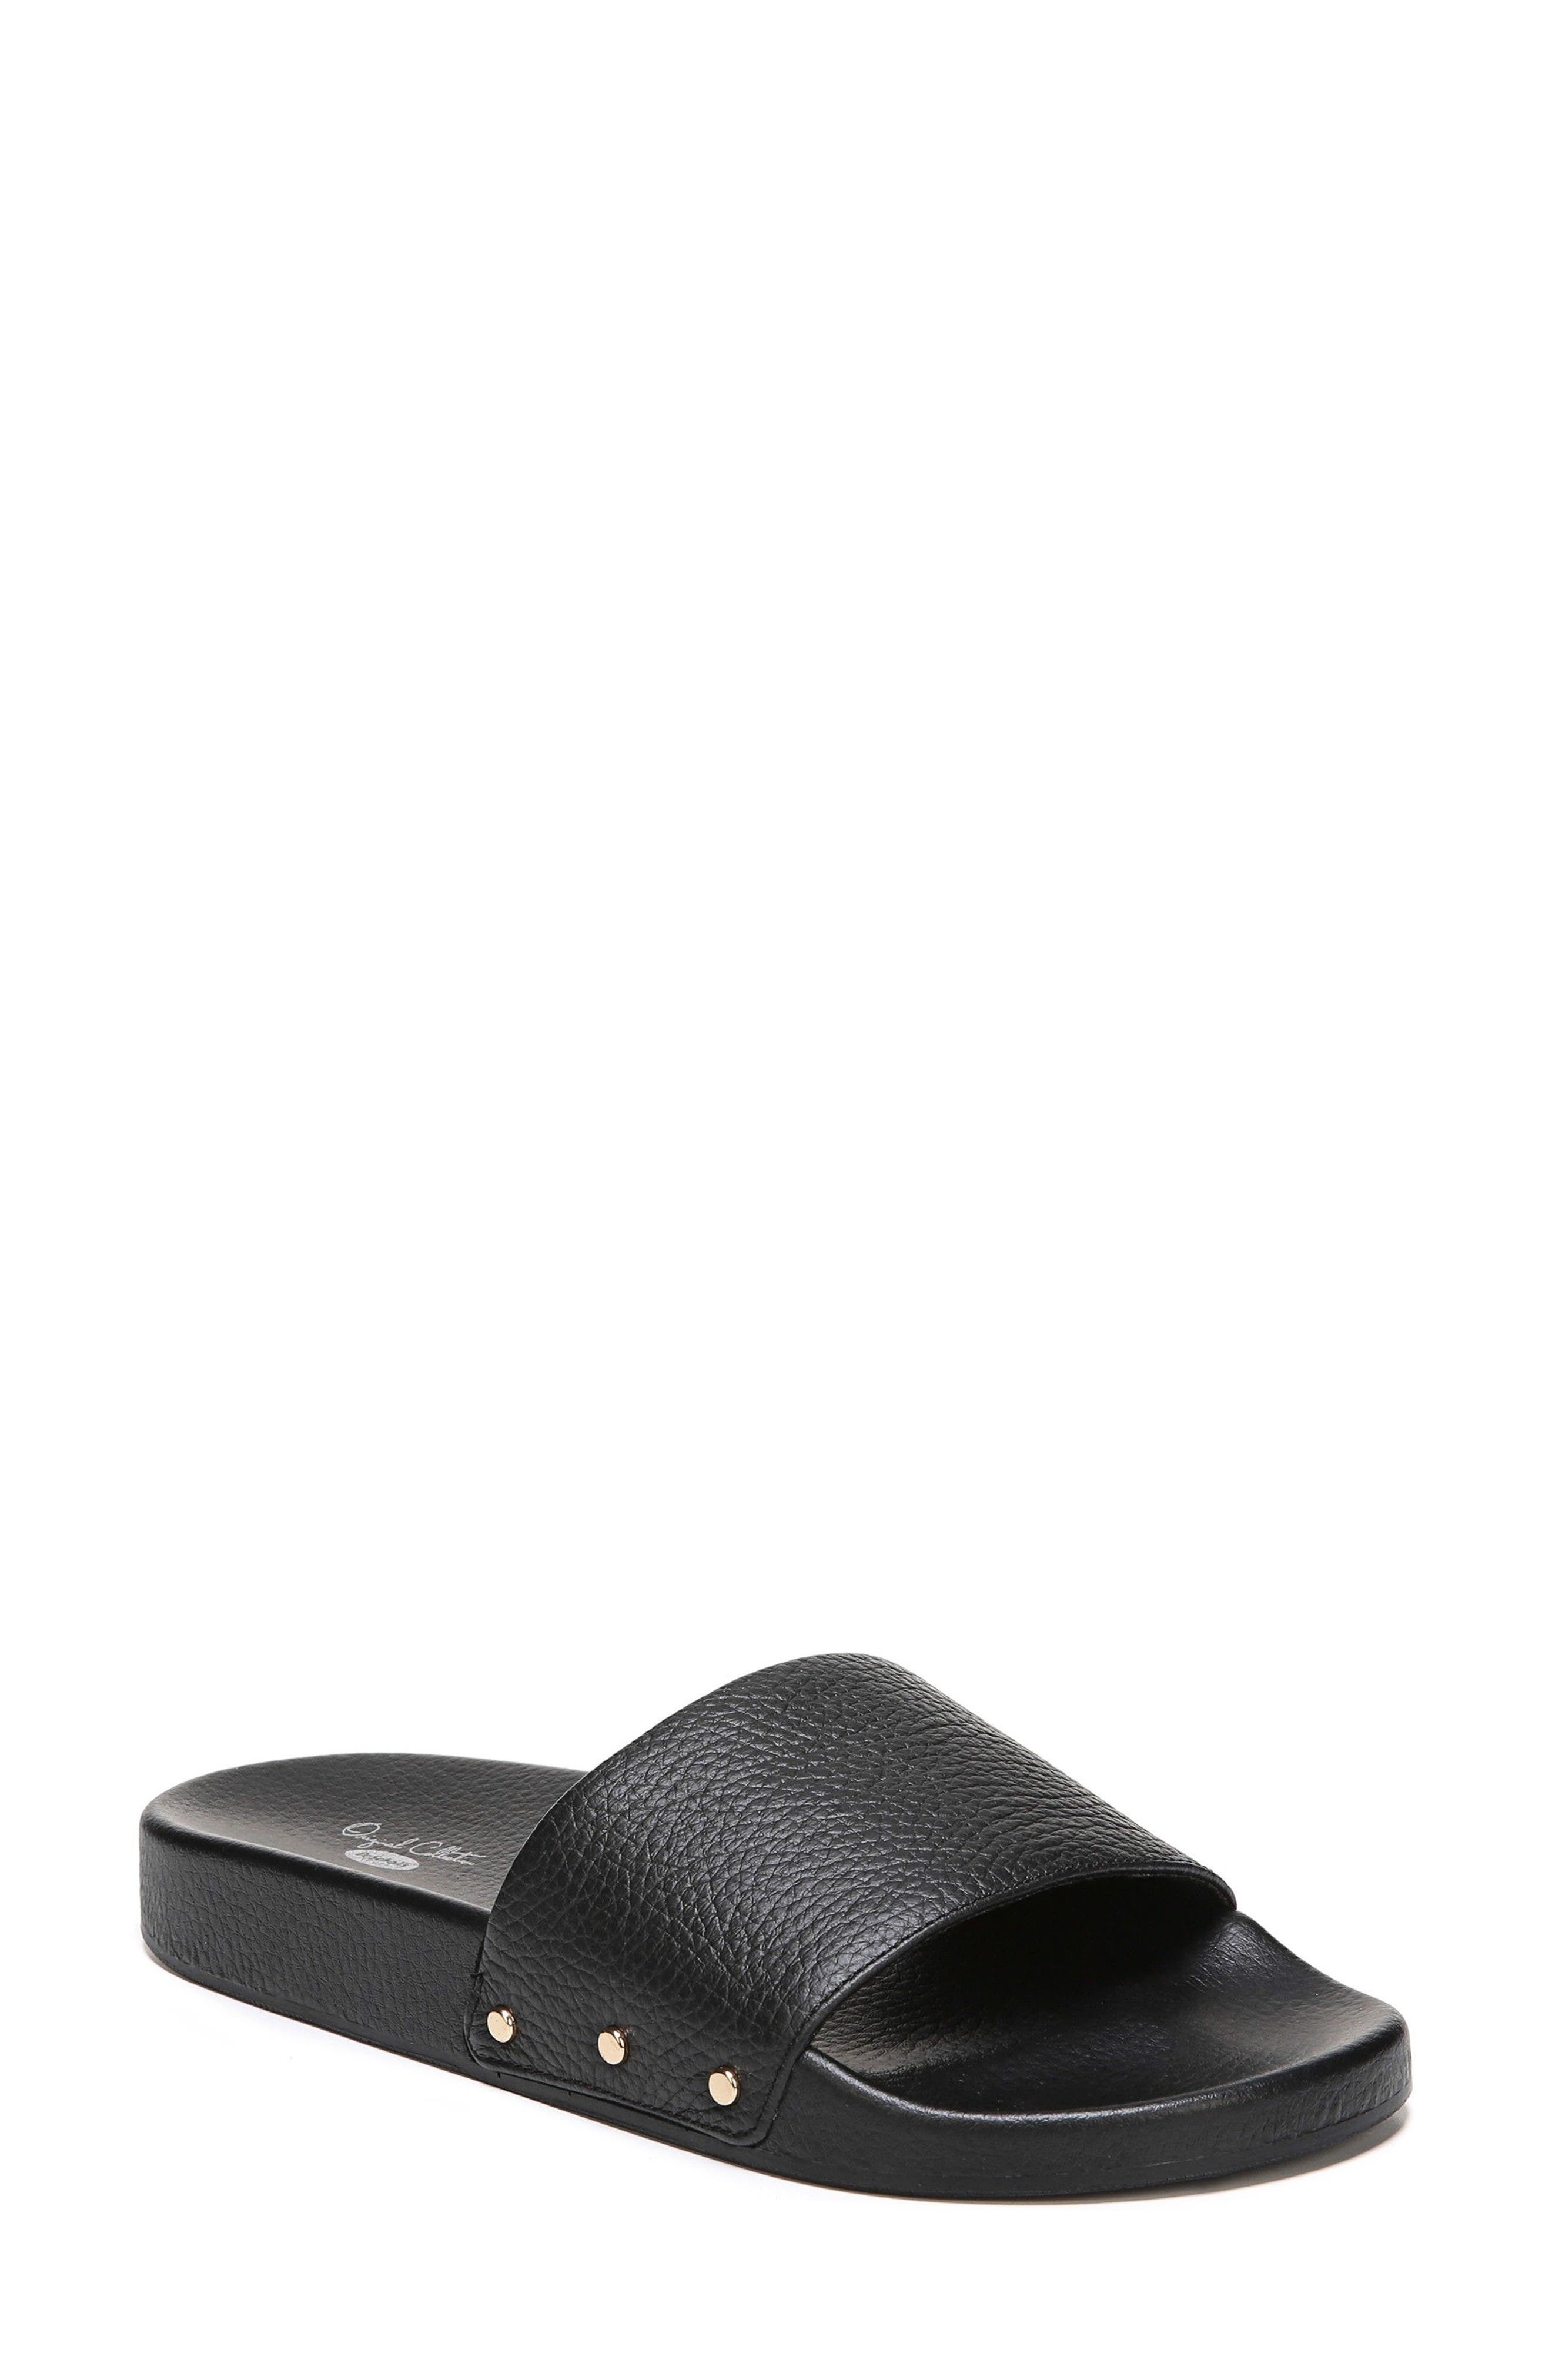 Dr. Scholl's Pisces Slide Sandal (Women